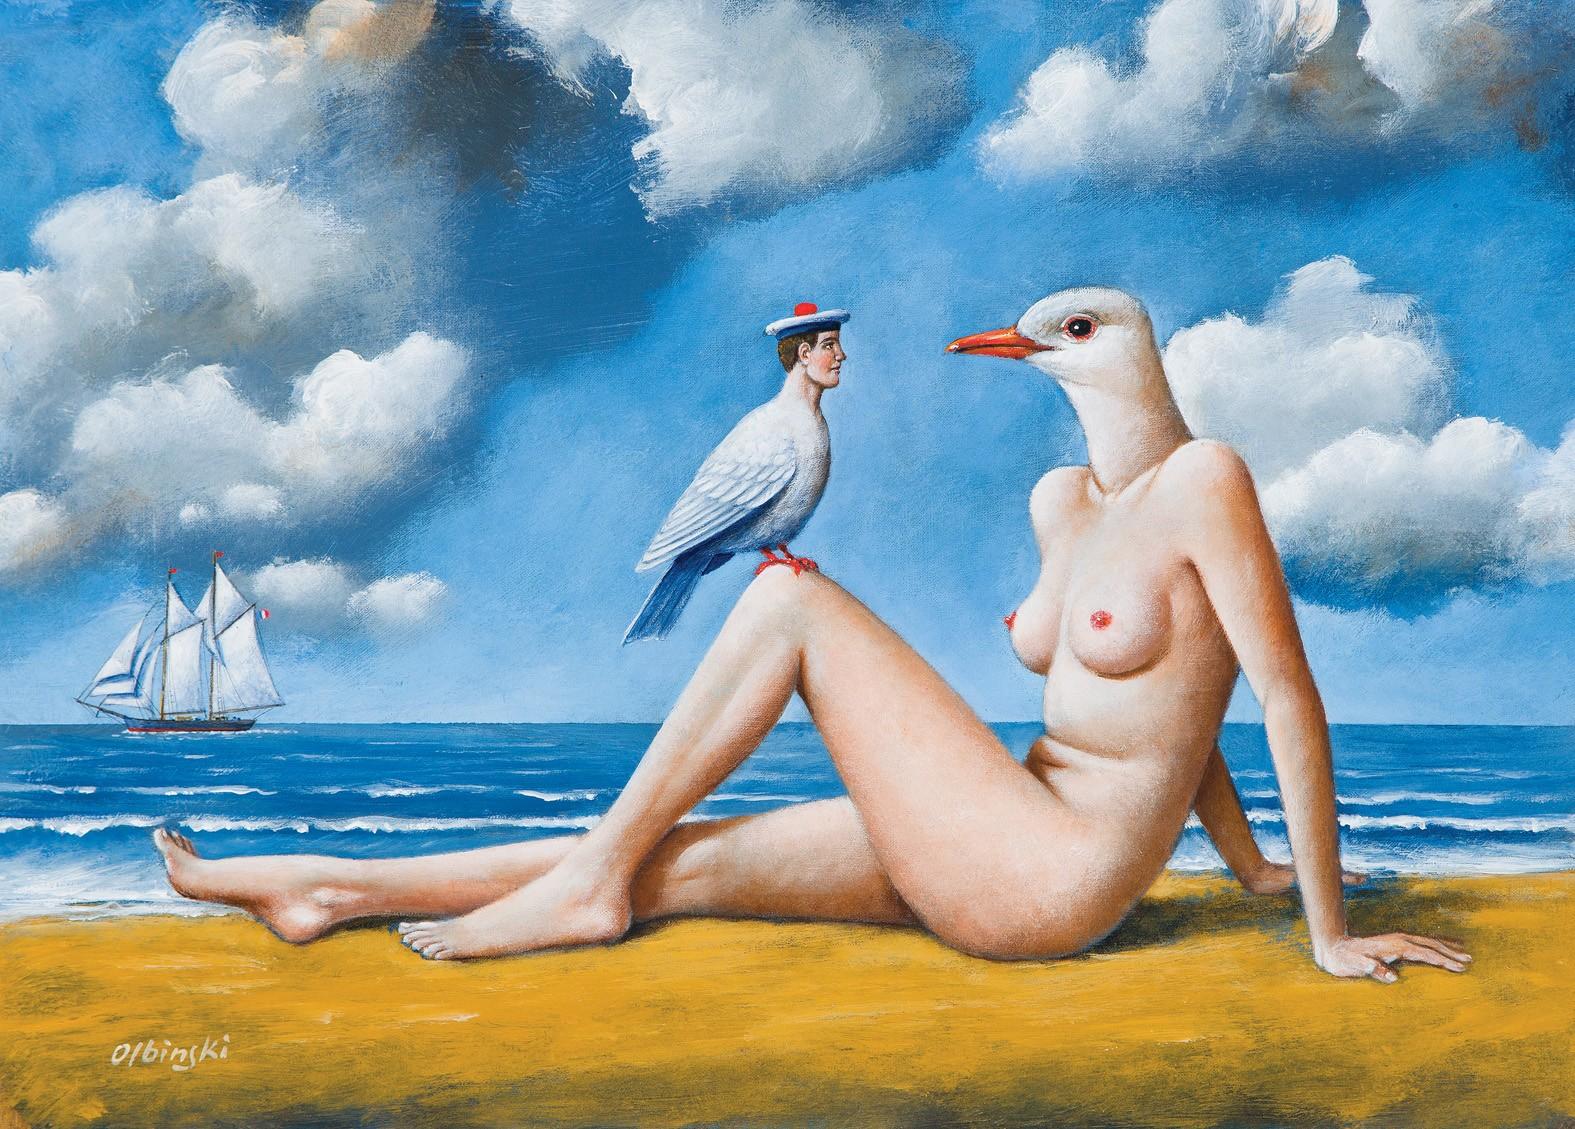 Rafał Olbiński, 7014 - French Sailor Lover - 33x45 cm